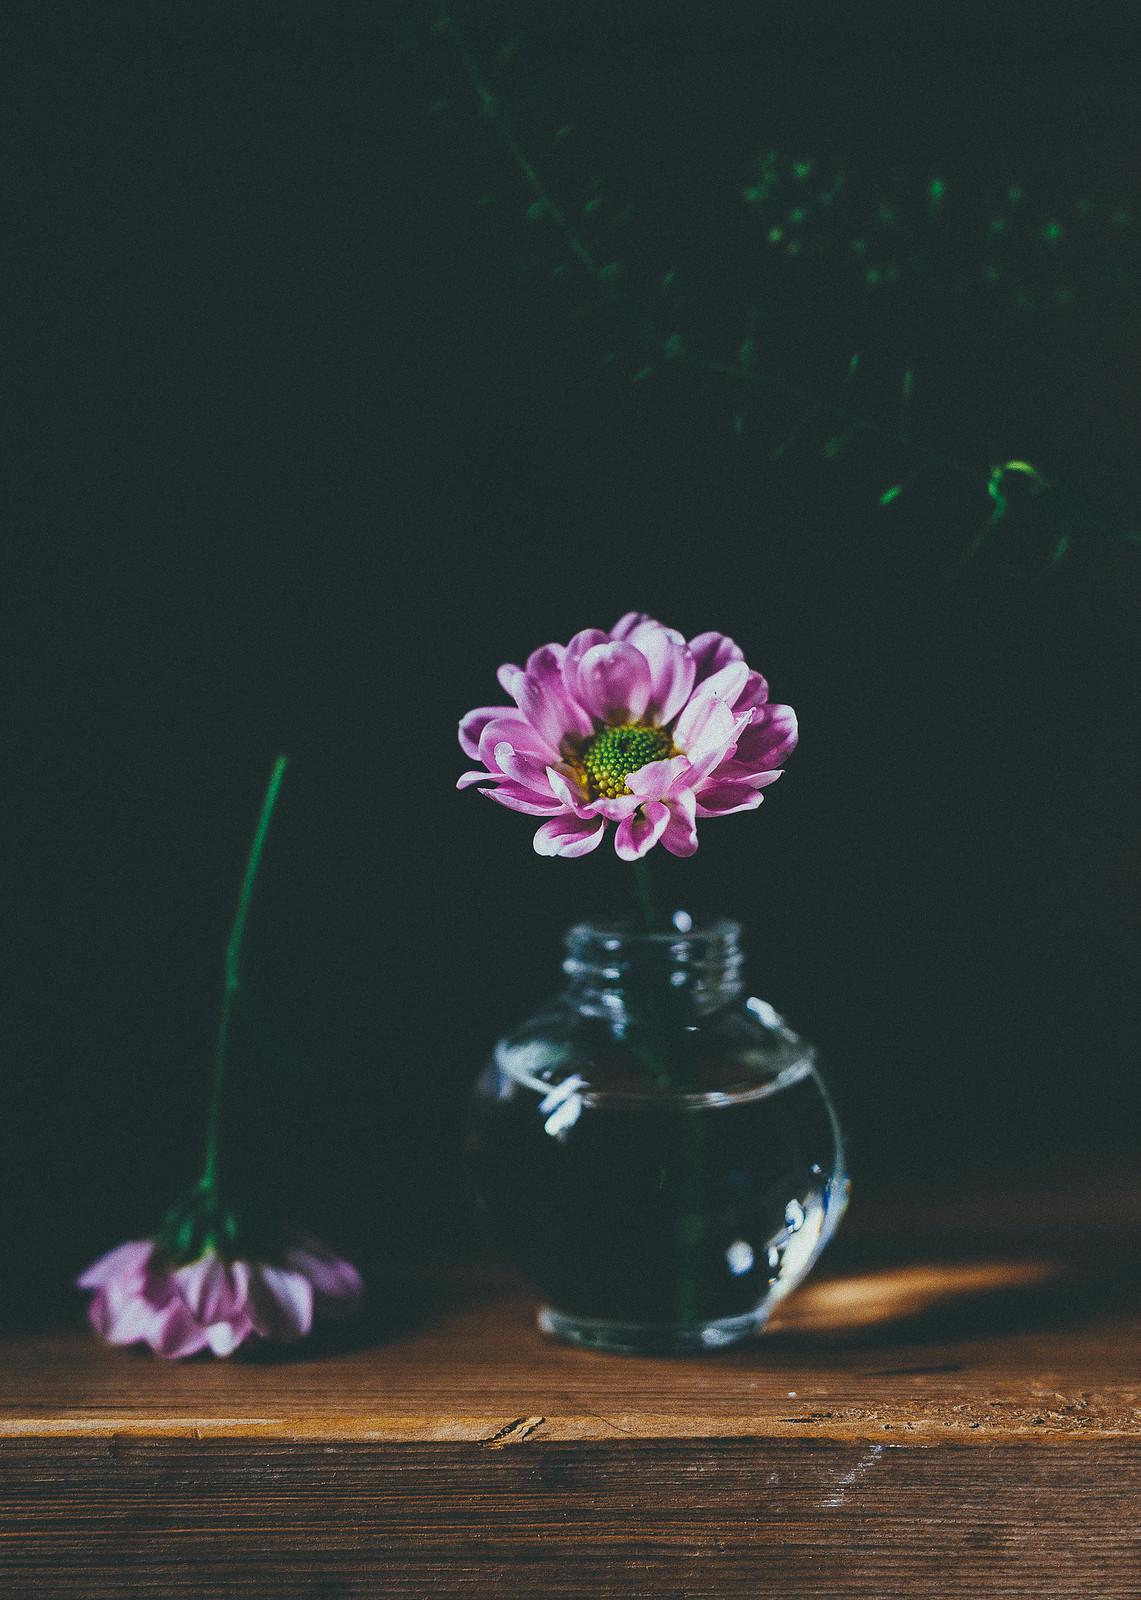 blomma - karinevelina.se